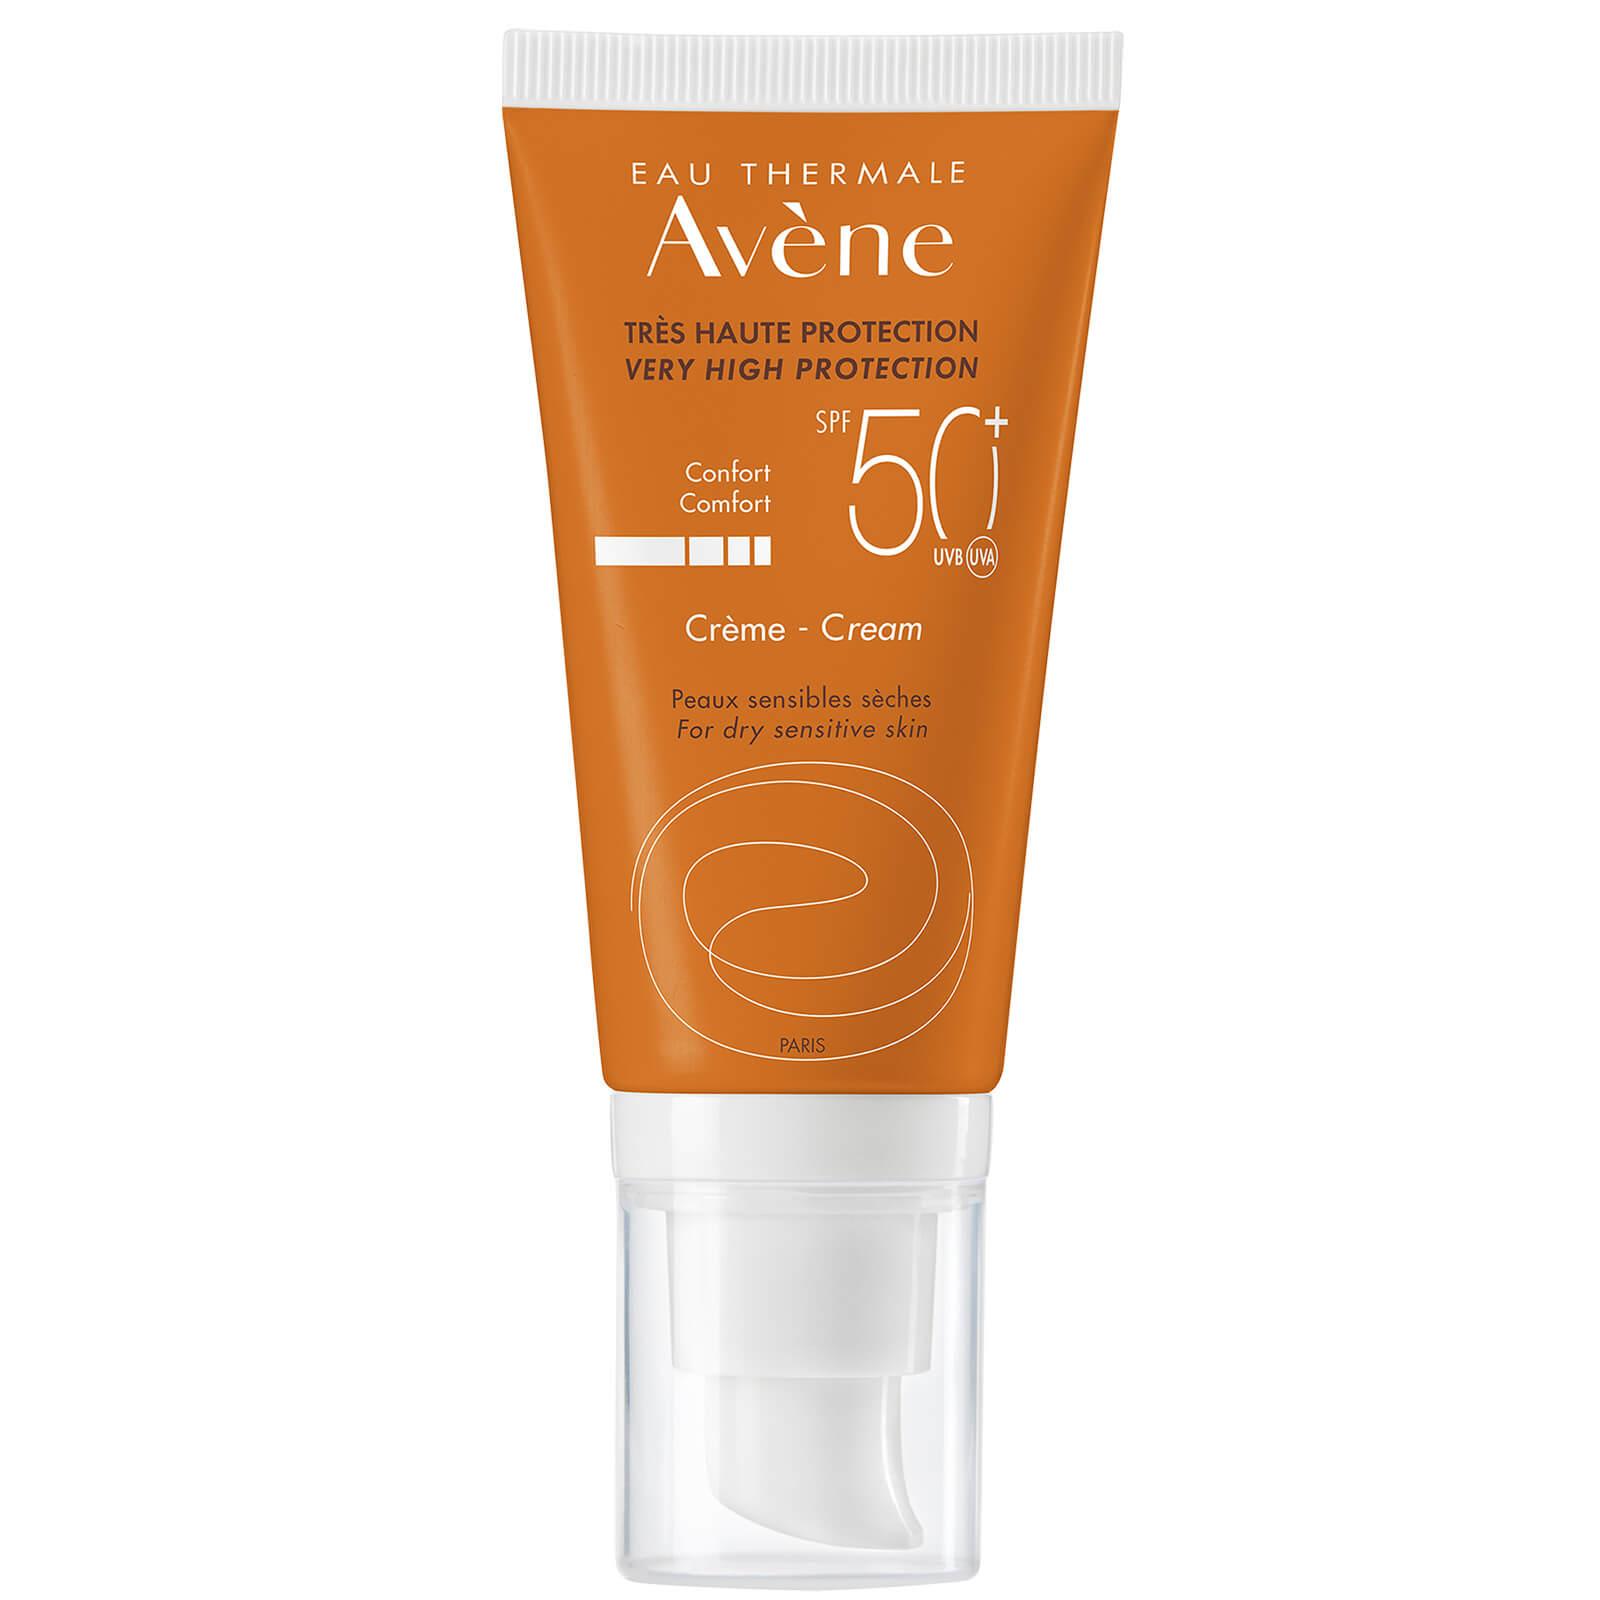 Avène Cream SPF50+ -aurinkovoide (50ml)